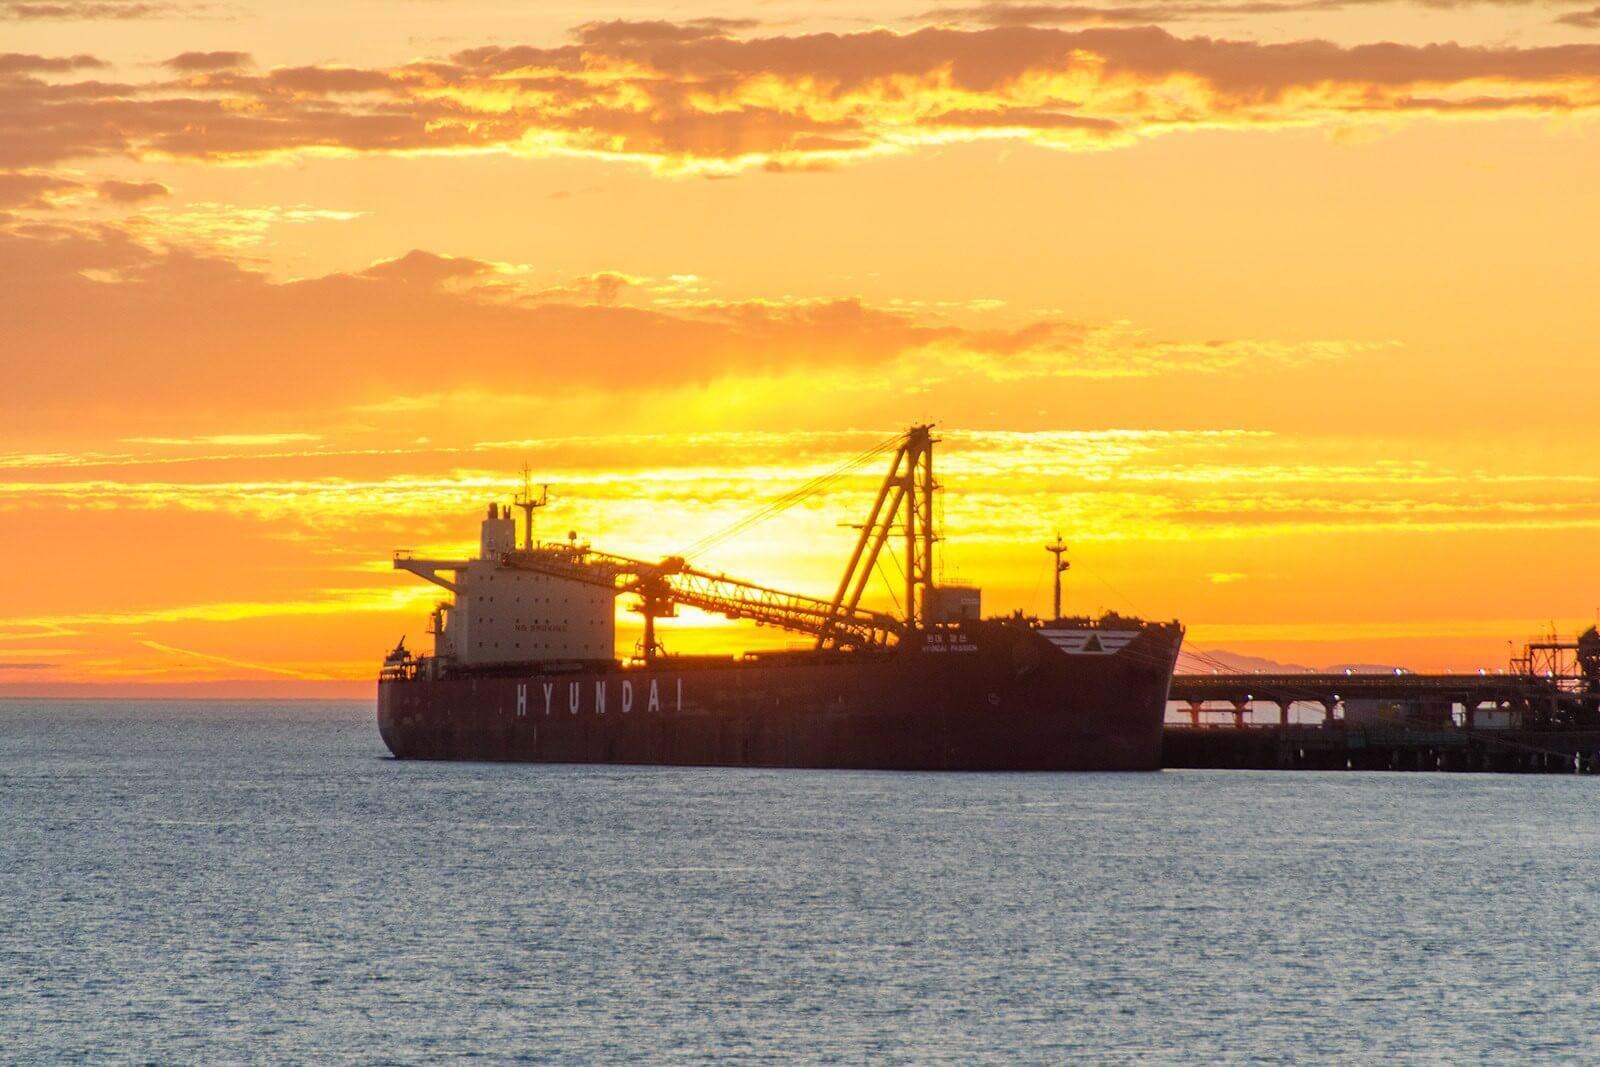 landscape_ship_oil_tanker_cranes_machine_sea_sky_sunset_clouds-43867 (1).jpg